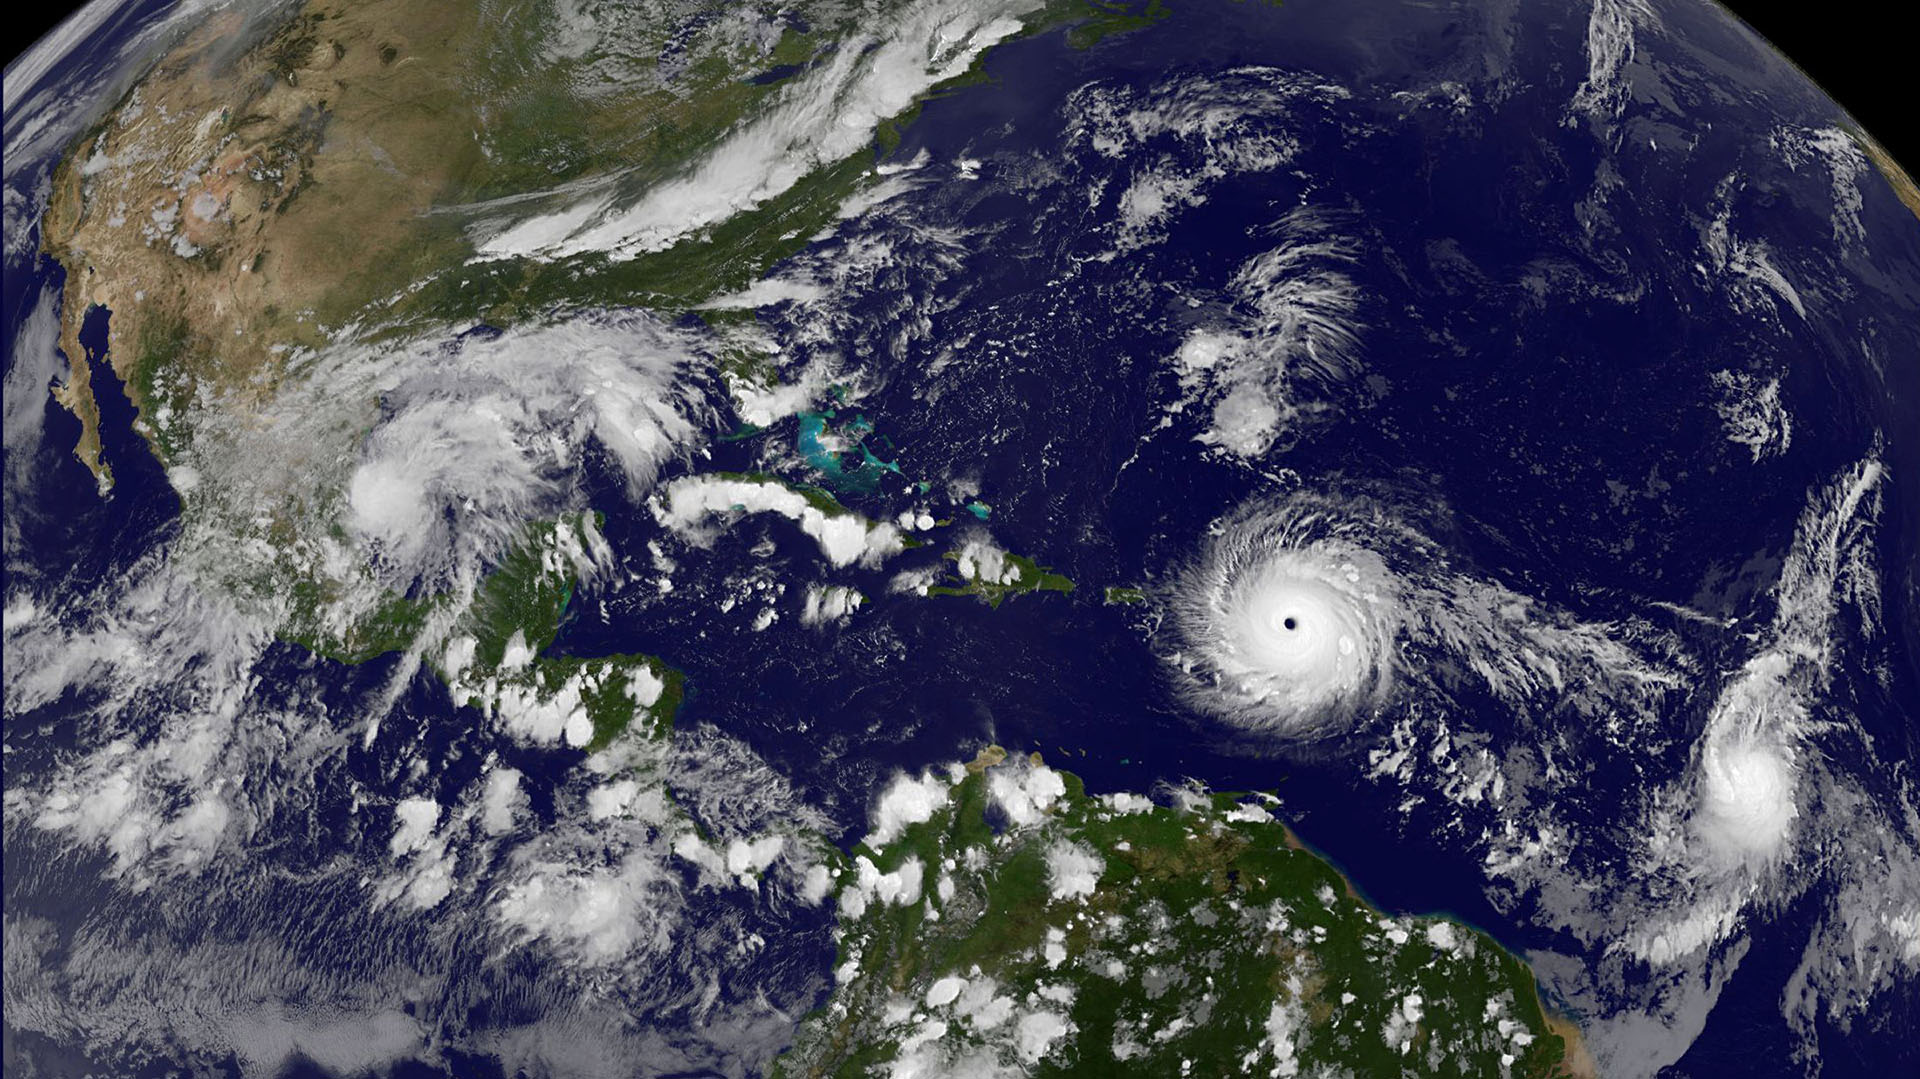 Imagen satelital del huracán Irma, captada por la NASA